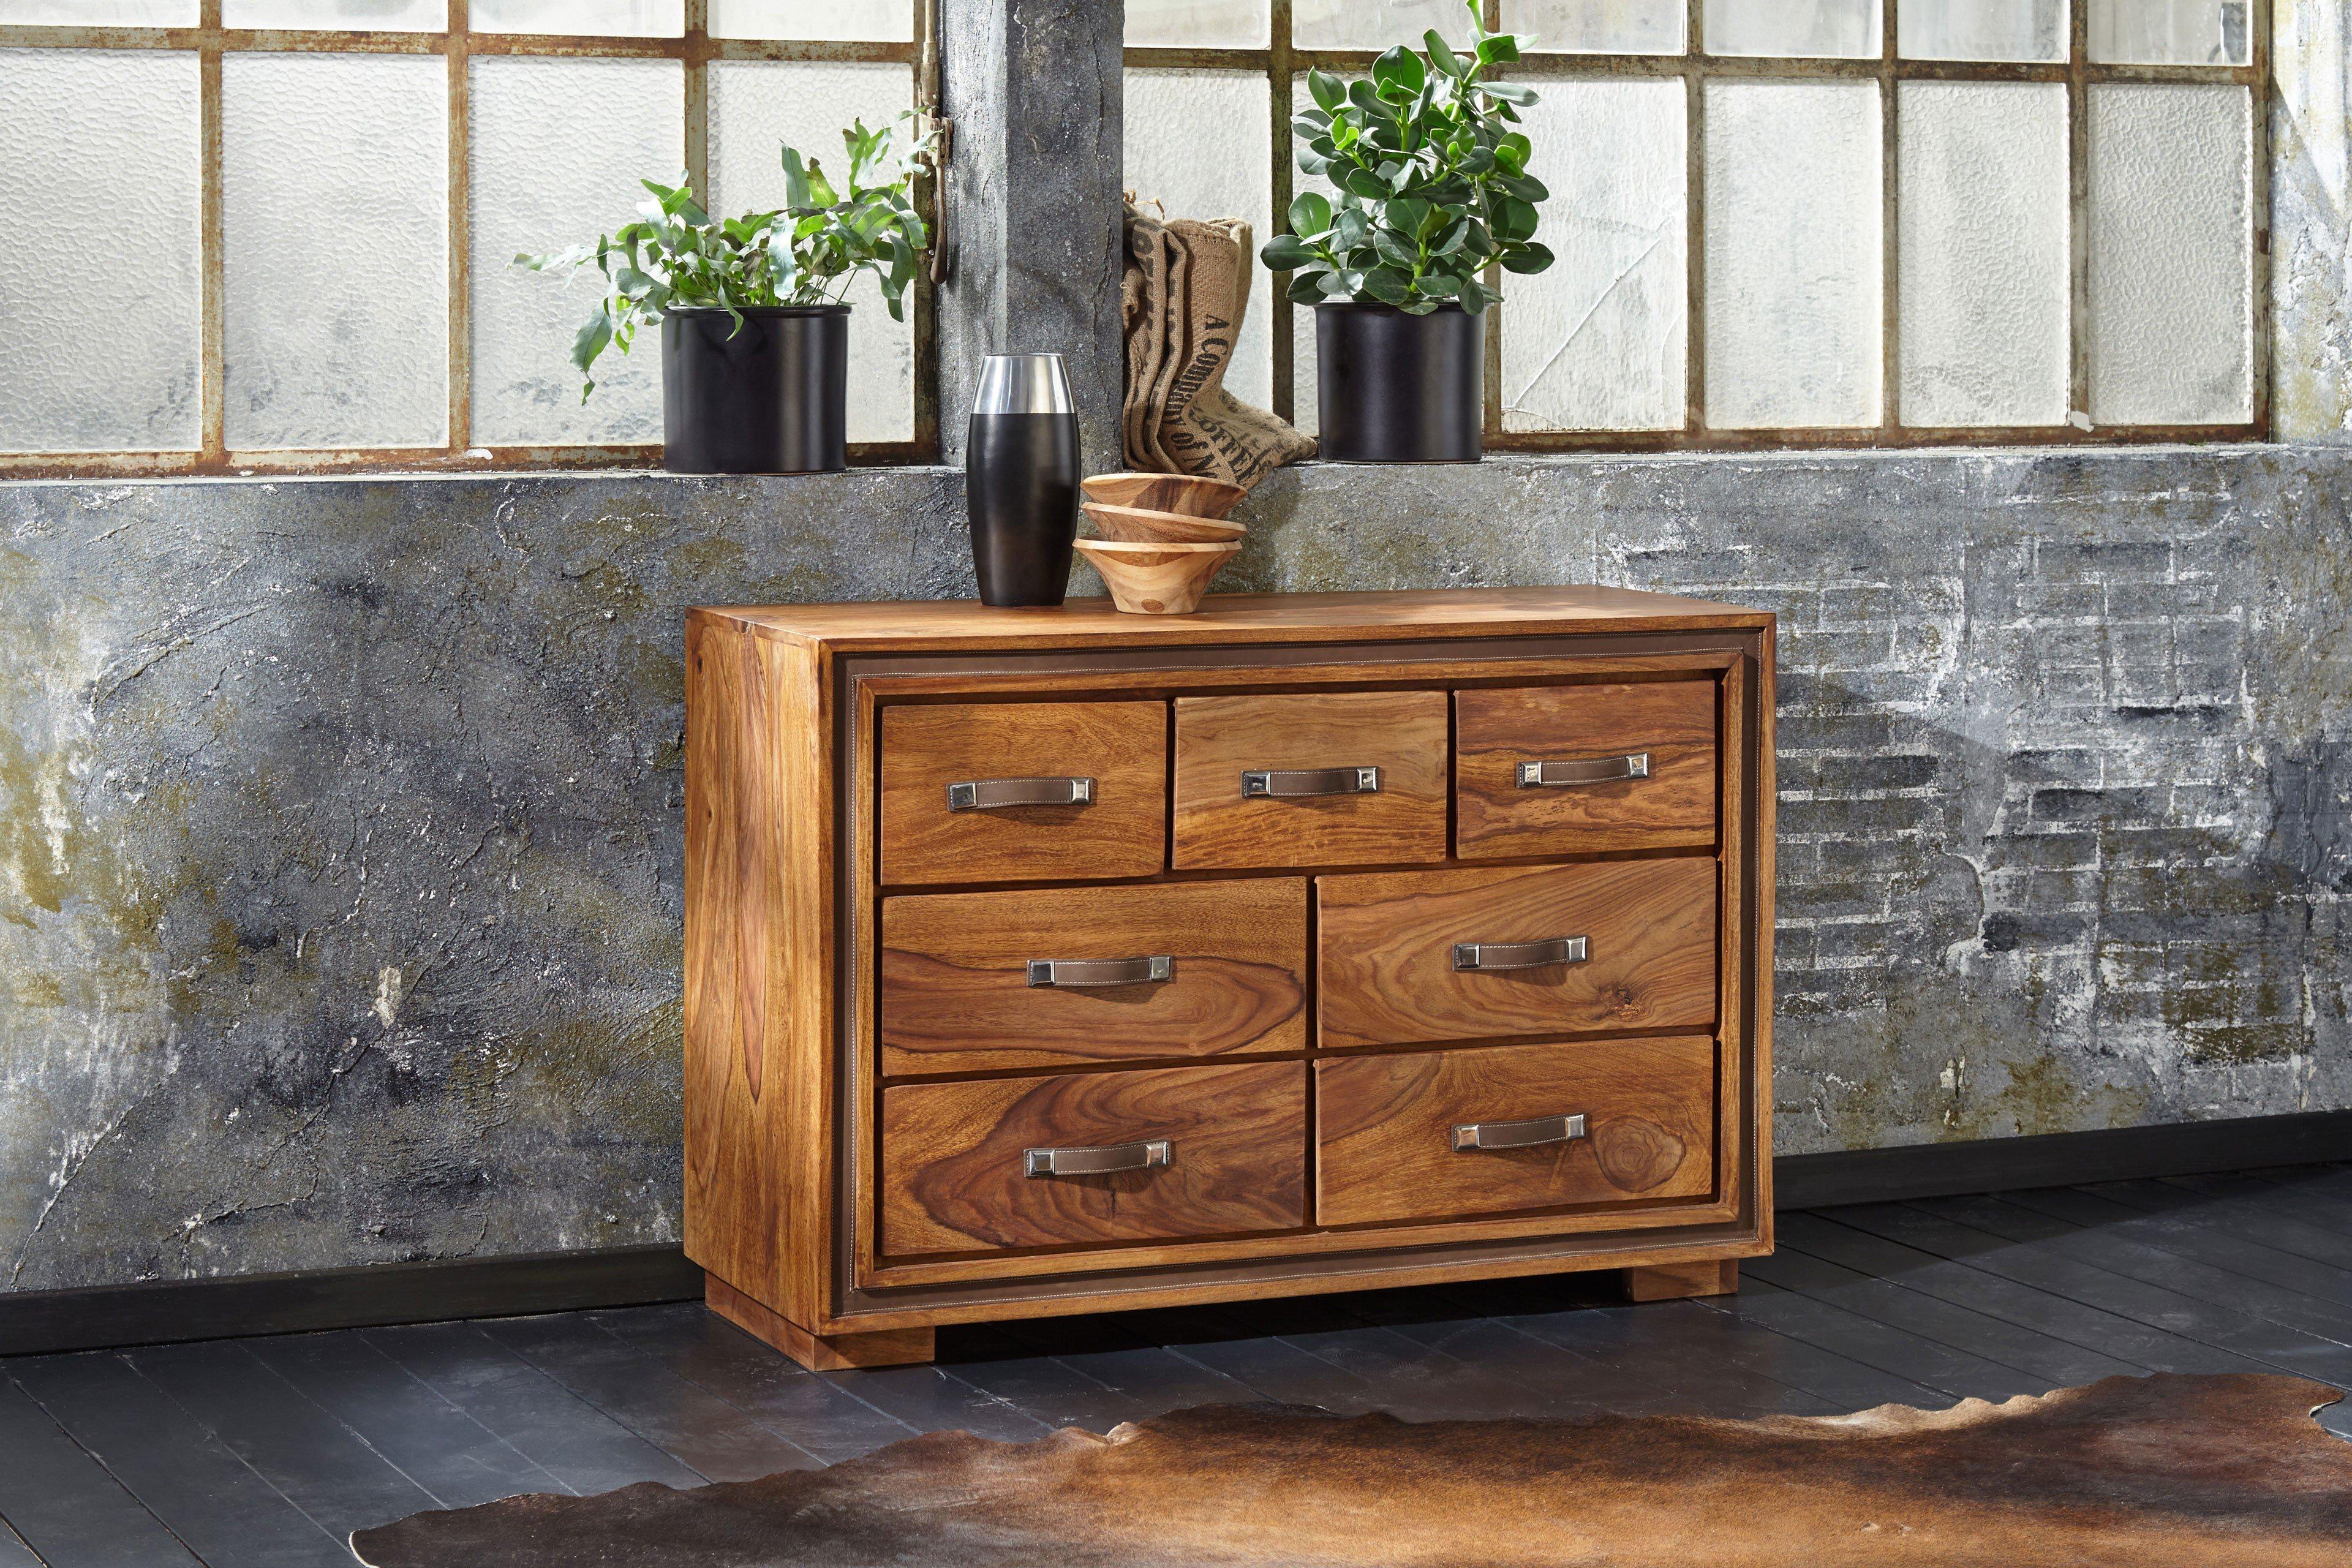 wolf m bel kommode in handarbeit m bel letz ihr online shop. Black Bedroom Furniture Sets. Home Design Ideas